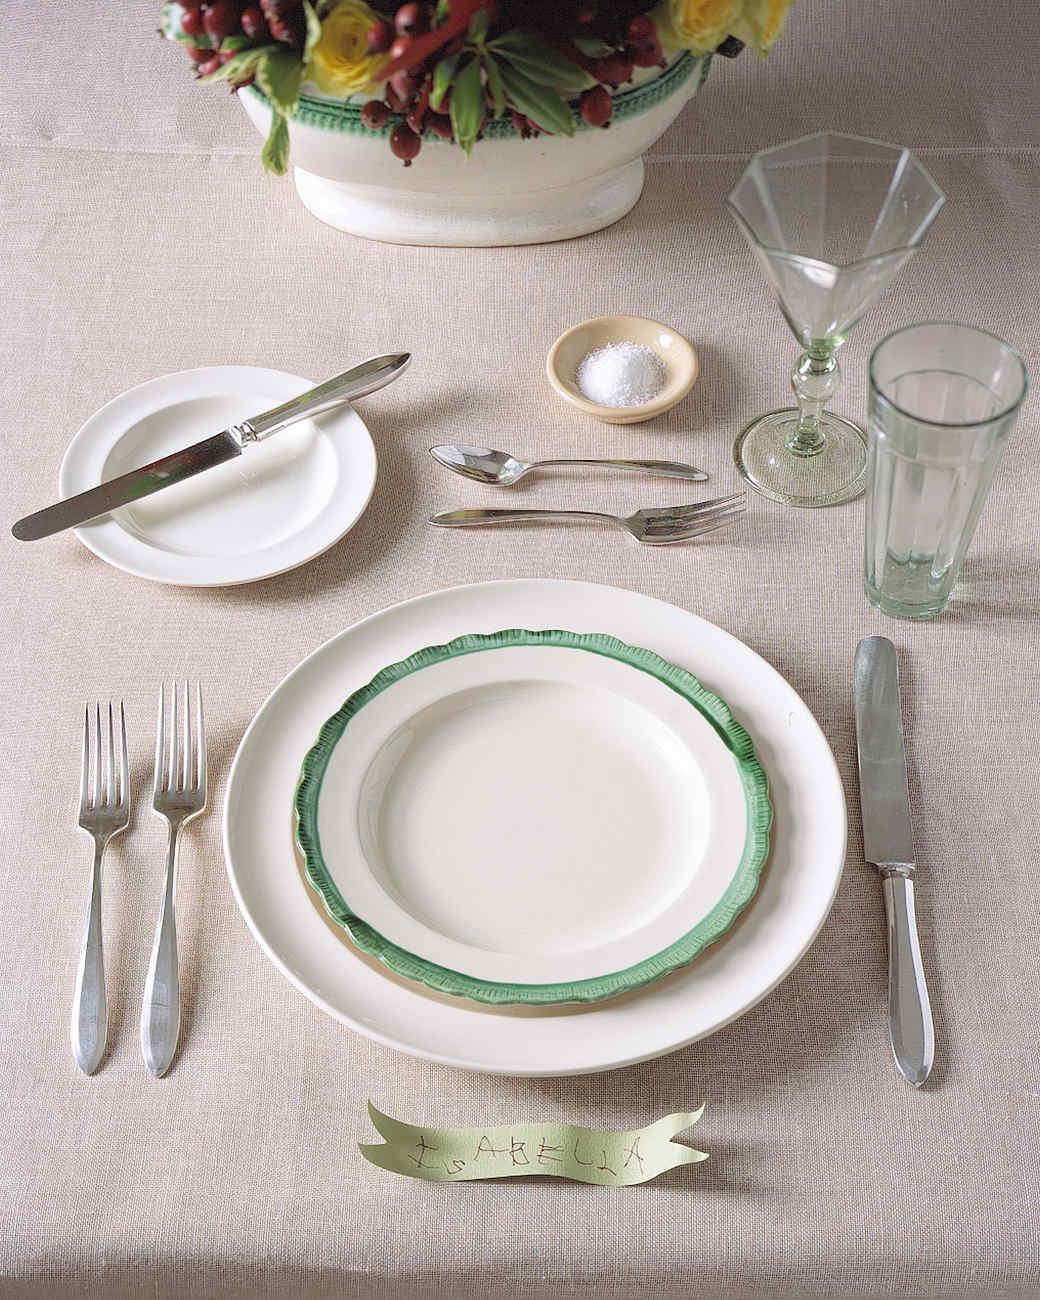 table-setting-2-a98979.jpg